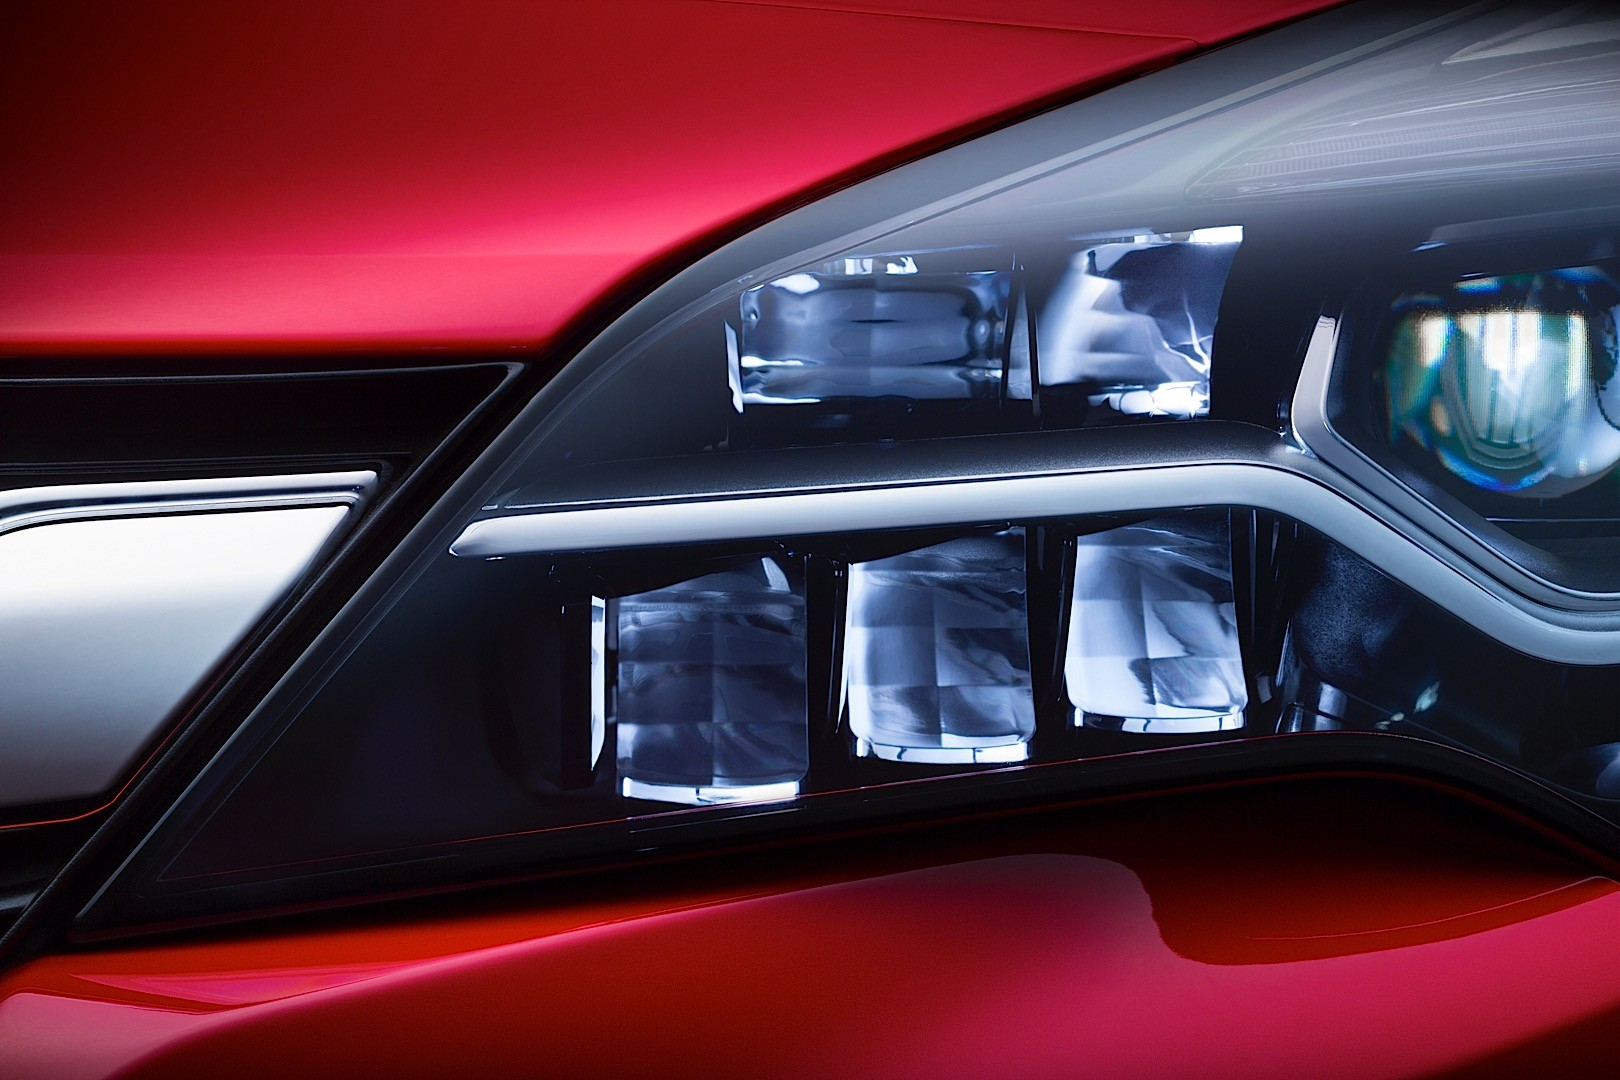 Opel Intellilux Led Matrix Headlights To Debut At Iaa 2015 On The Opel Astra K Autoevolution